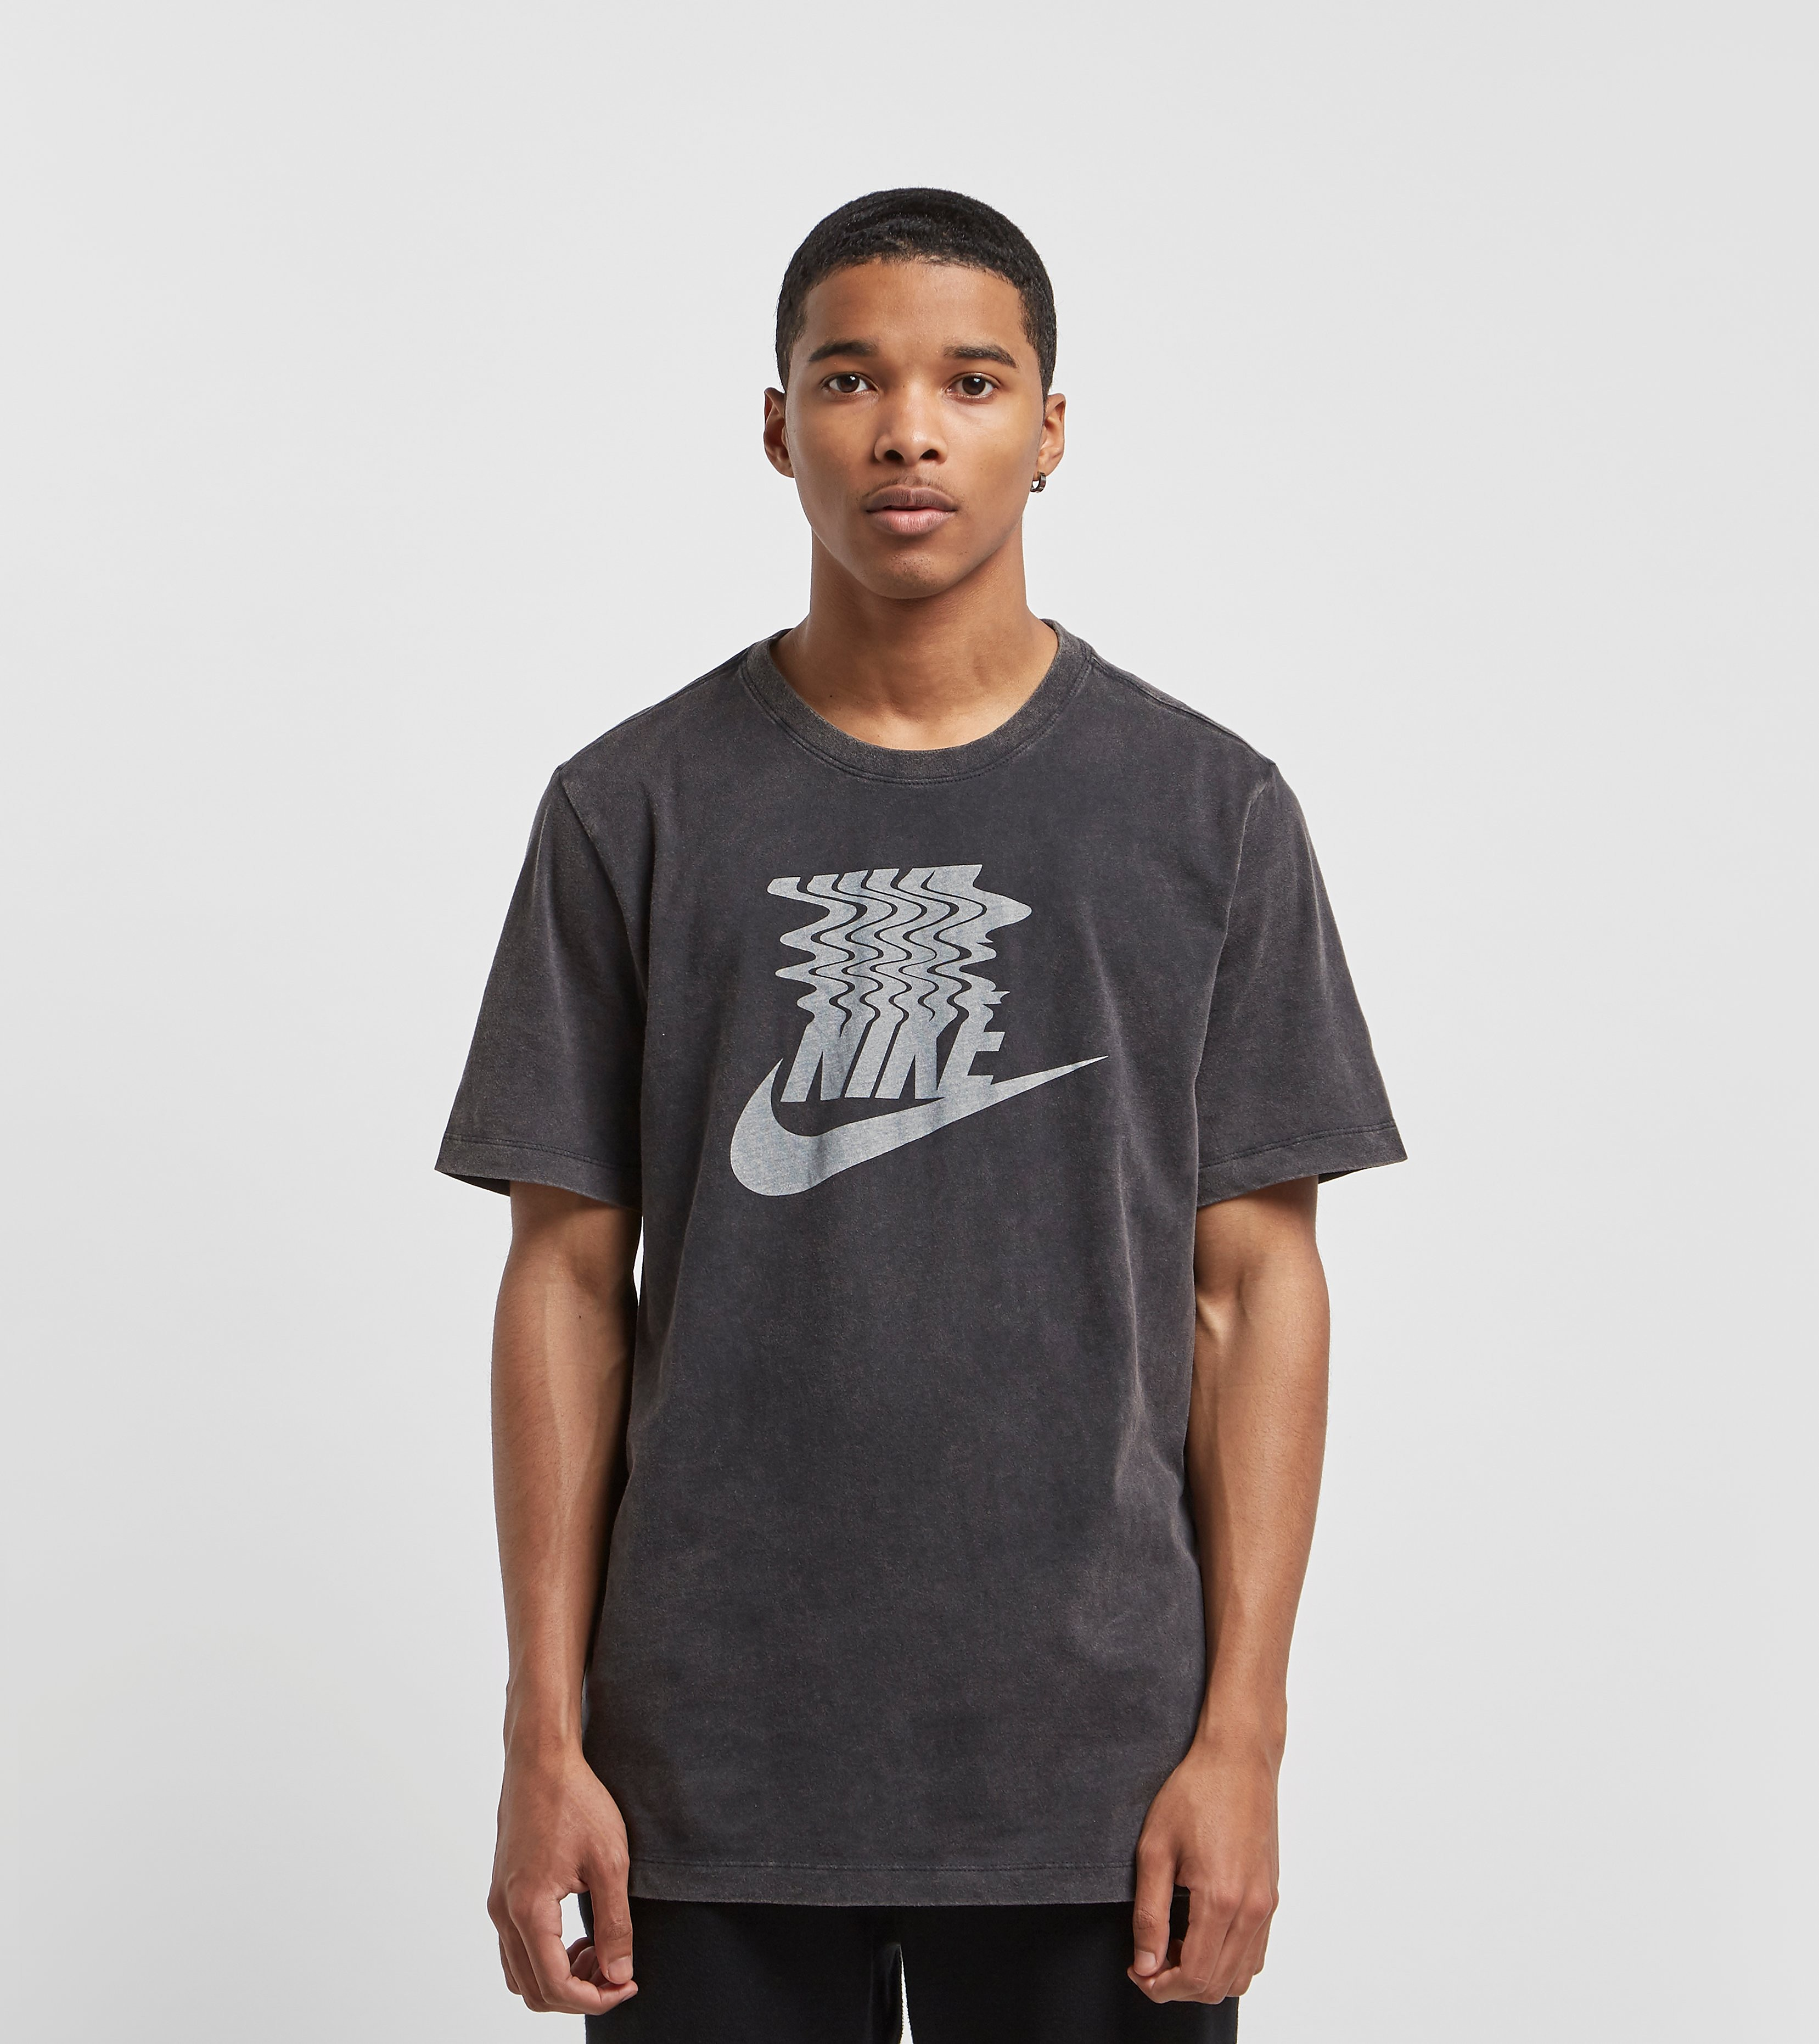 Nike Vibes Black